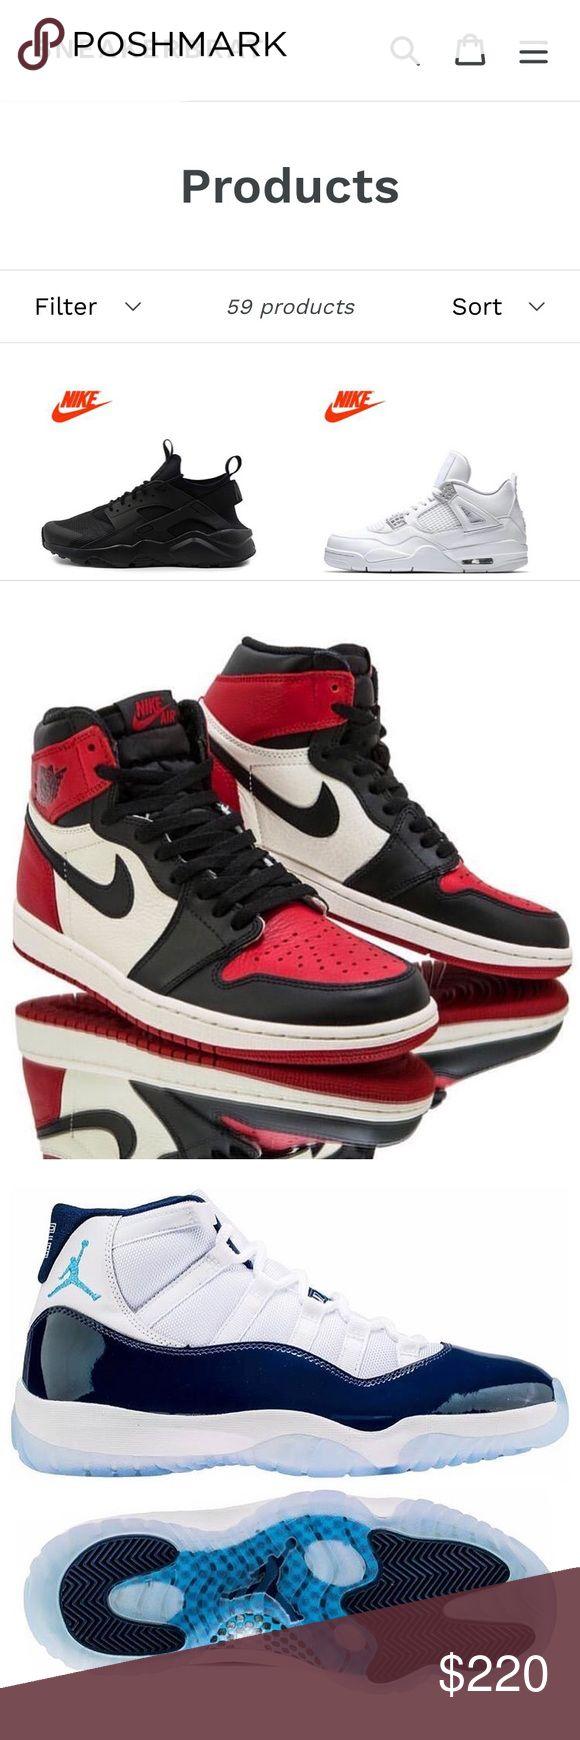 Yeezy, Jordans, Nike, converse